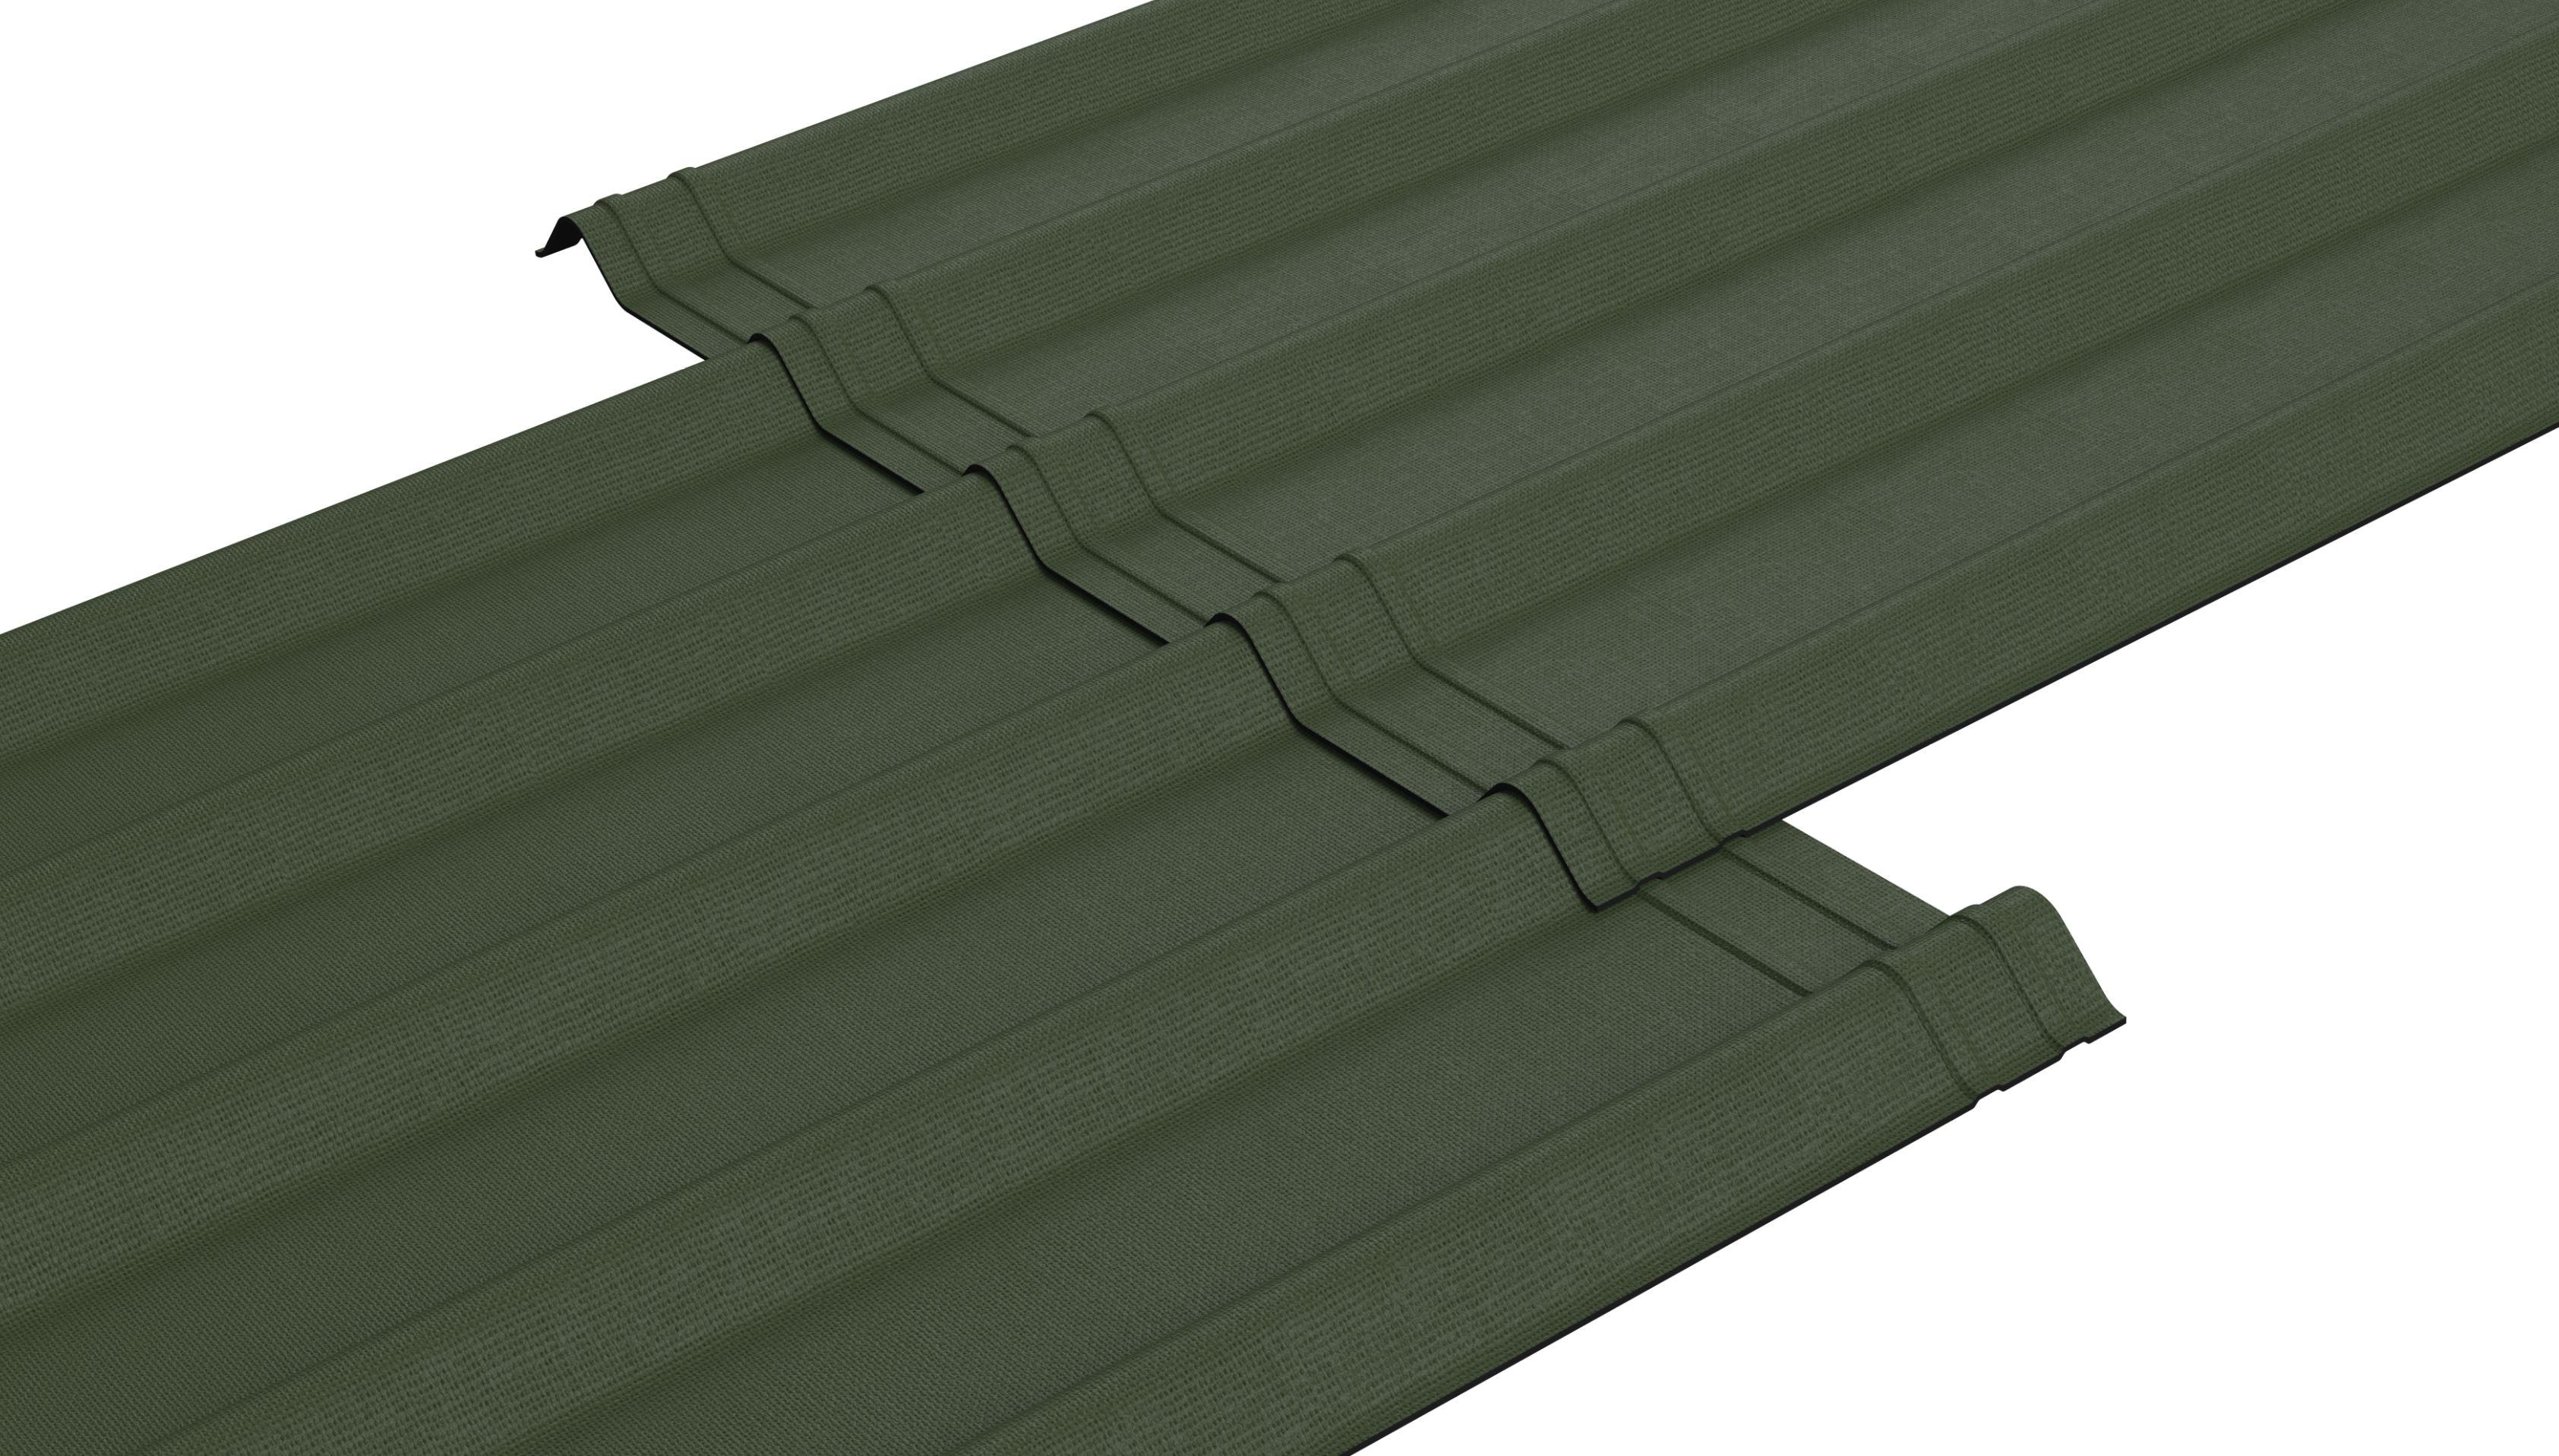 Ondura Edge Corrugated Asphalt Roofing For The Look Of Metal